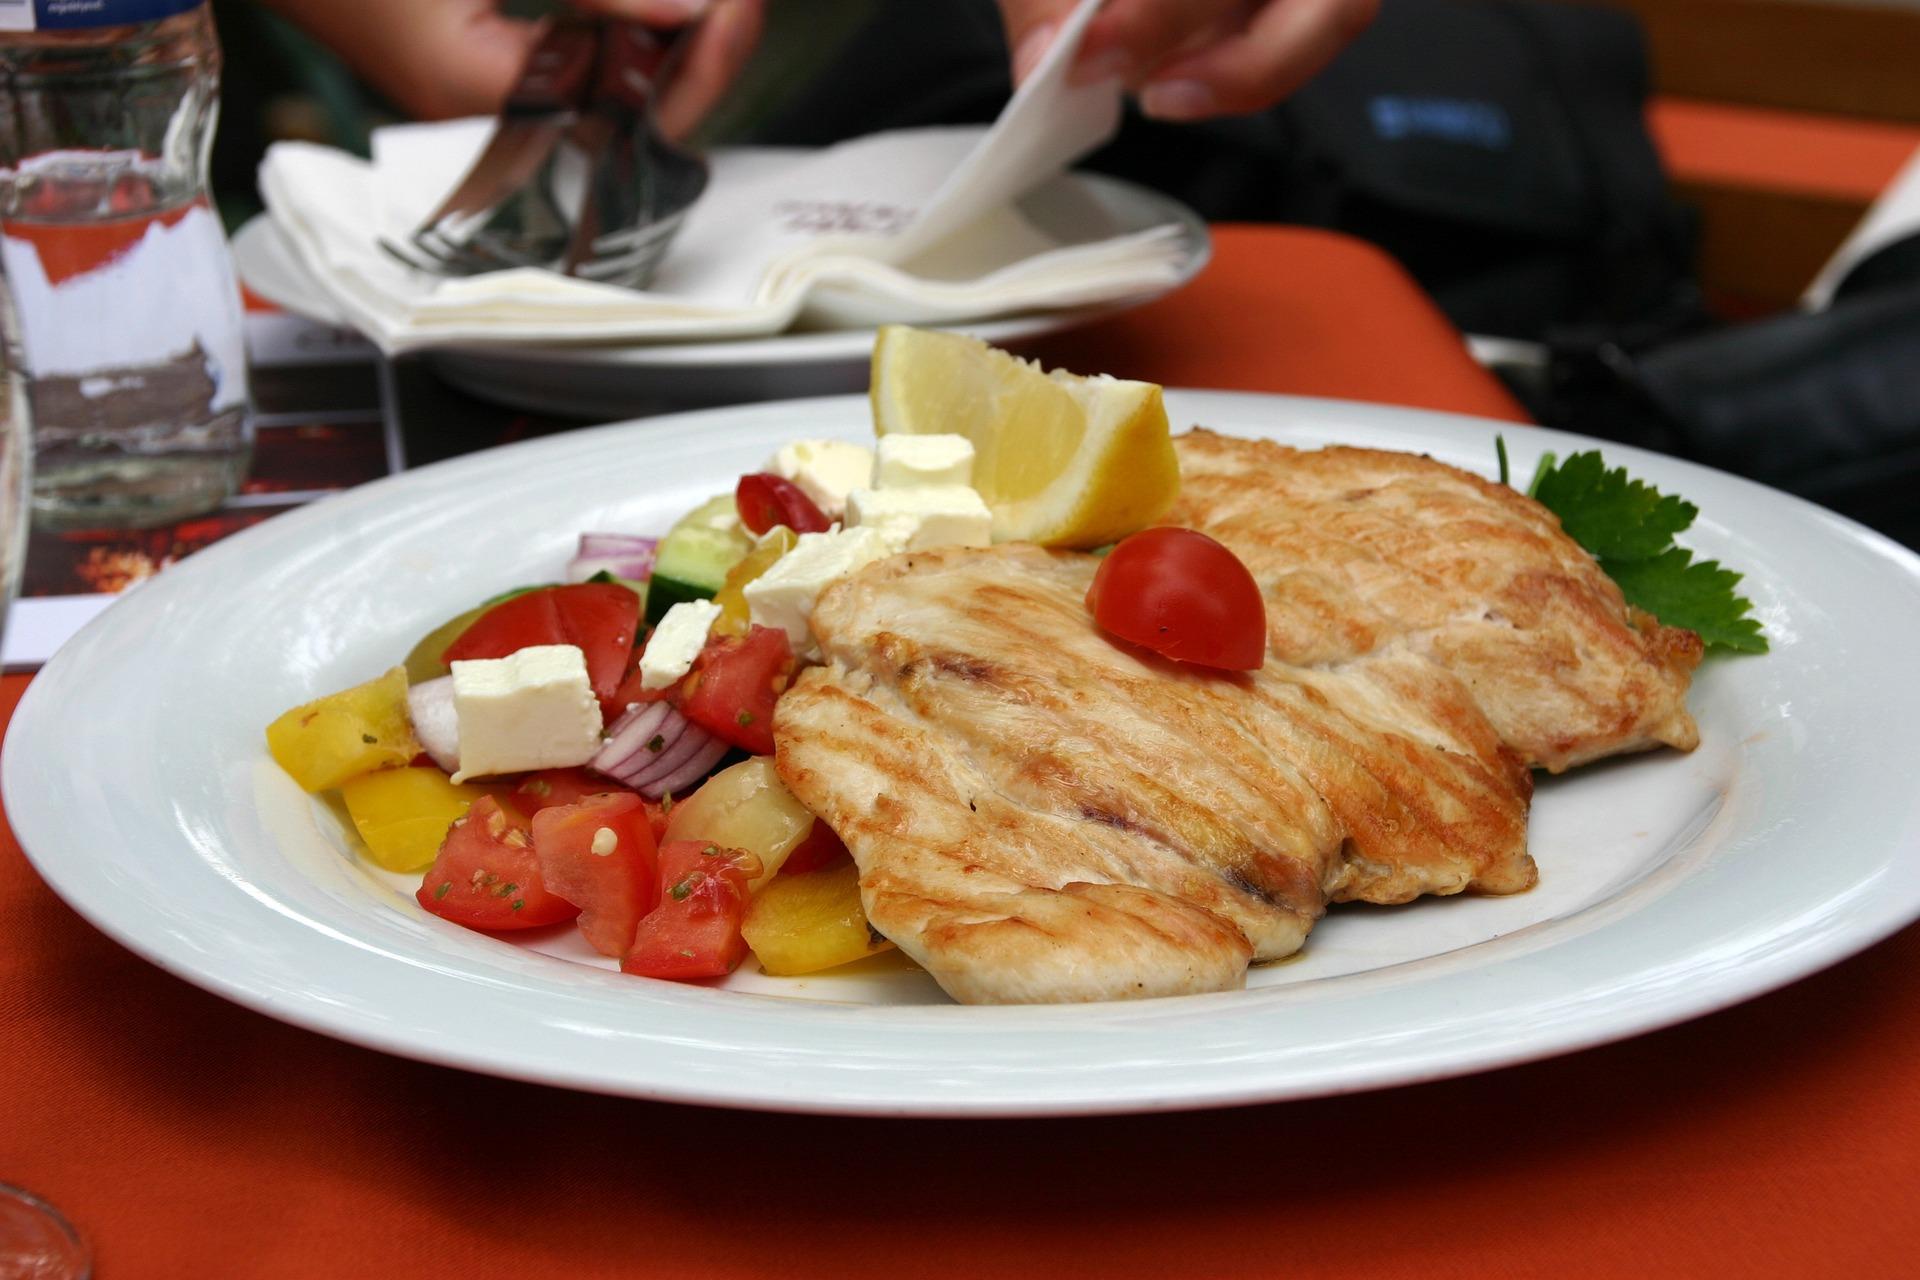 mangio sano ma non dimagrisco proteine